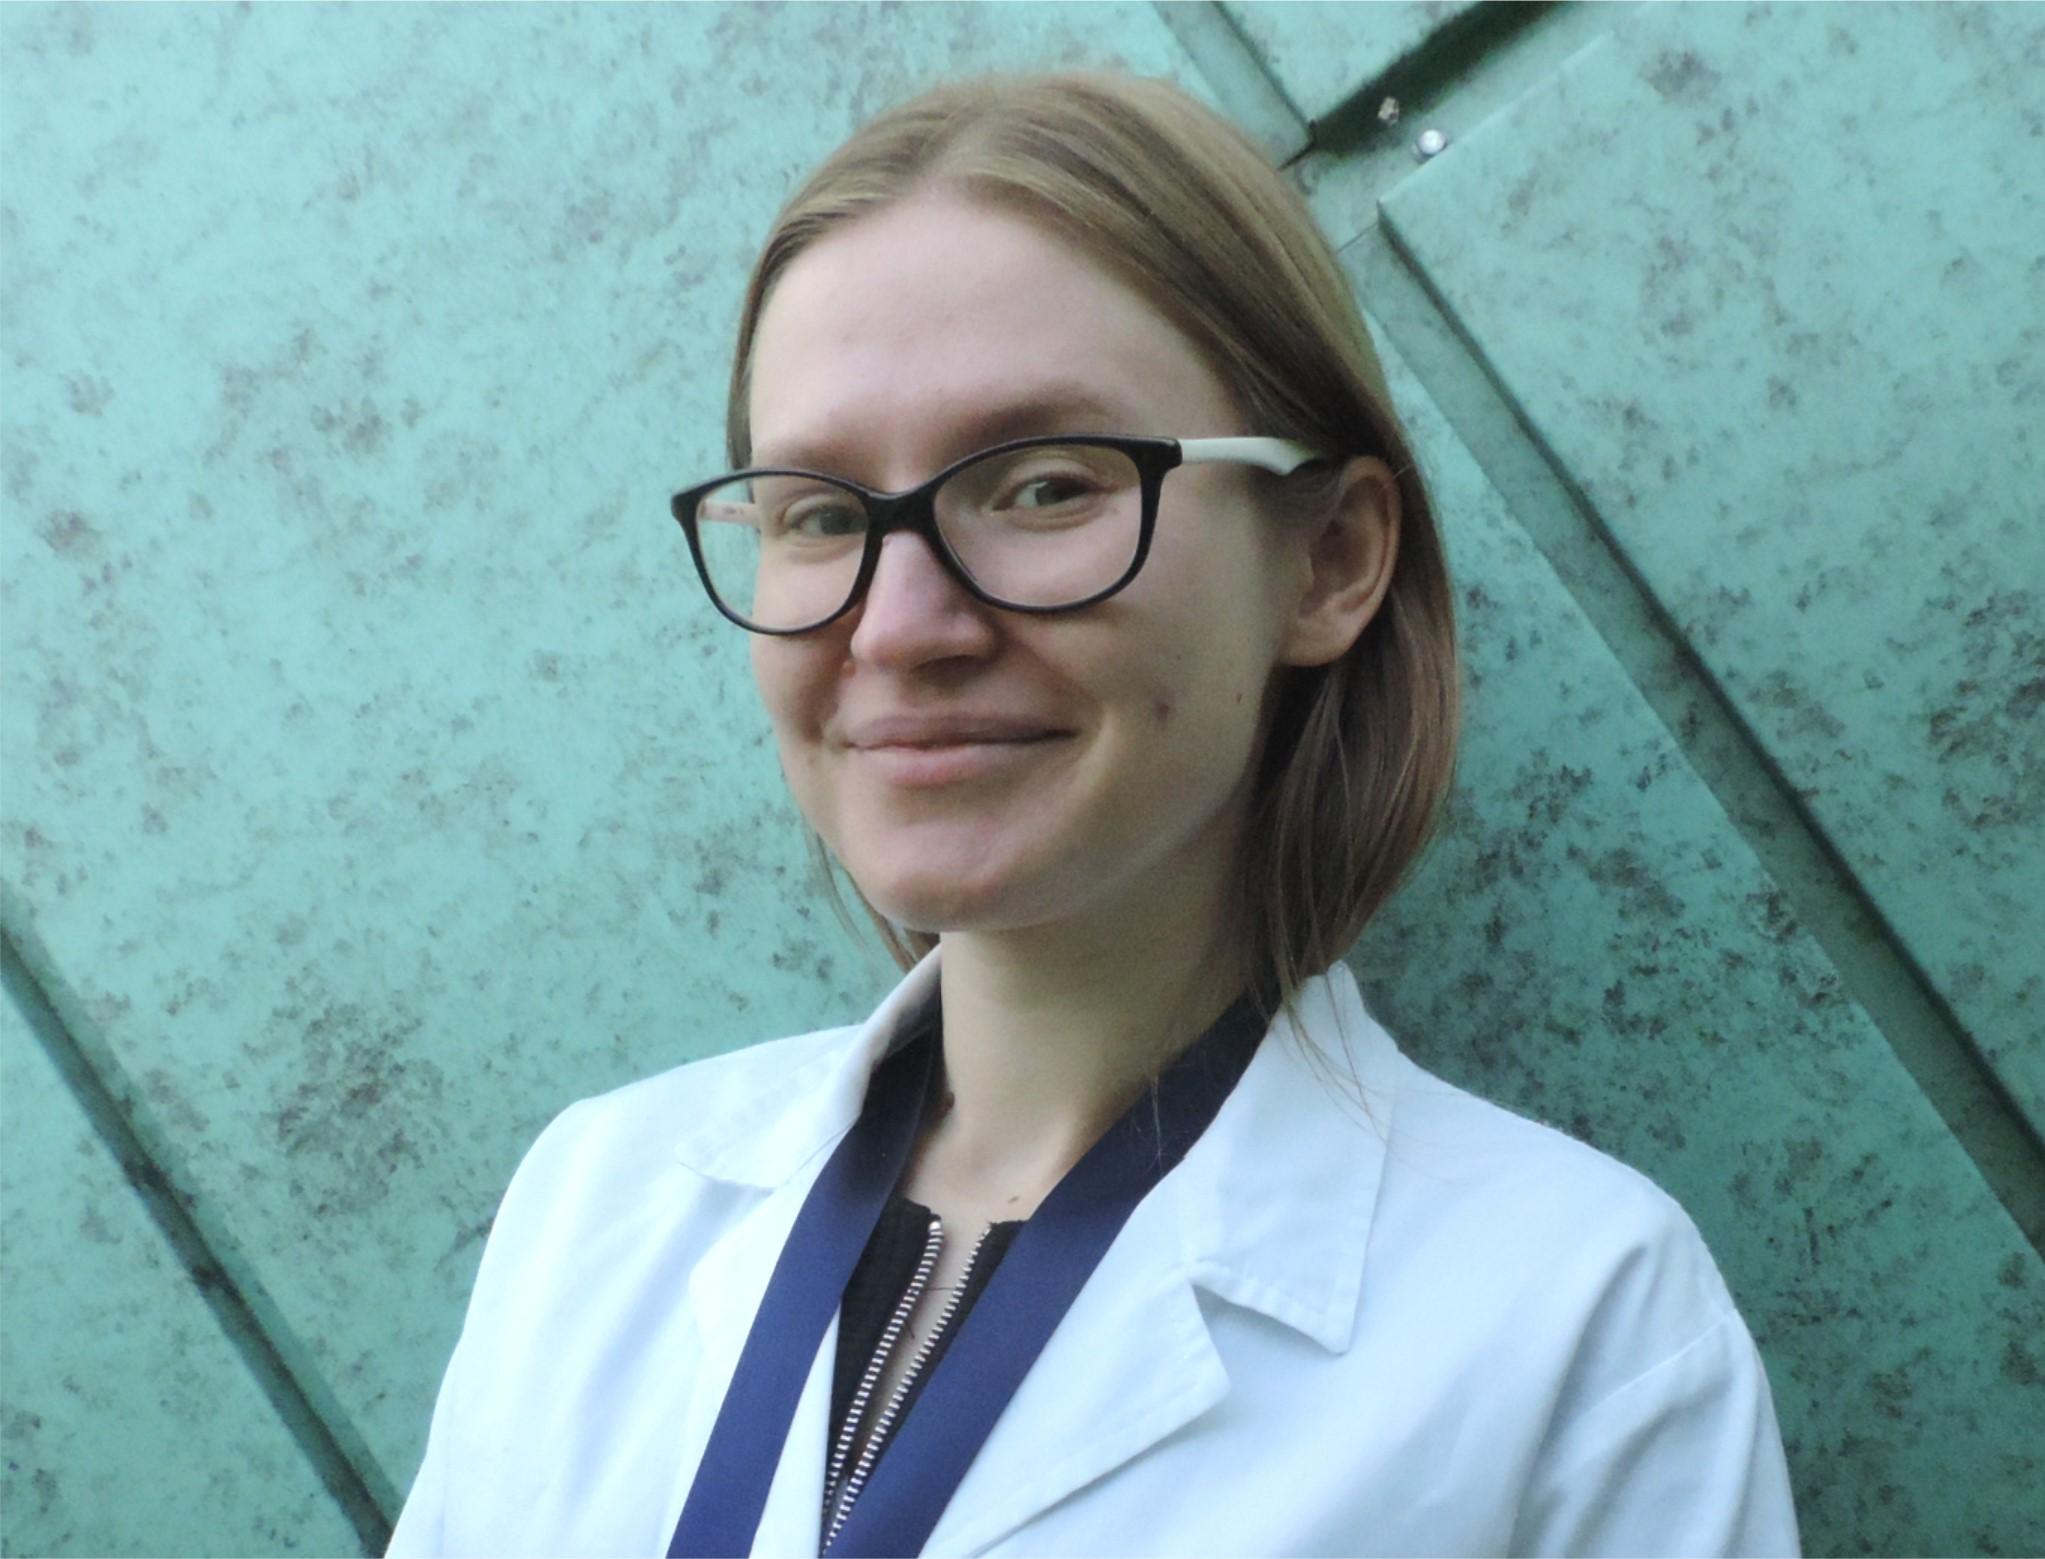 Gabriela Vojcik